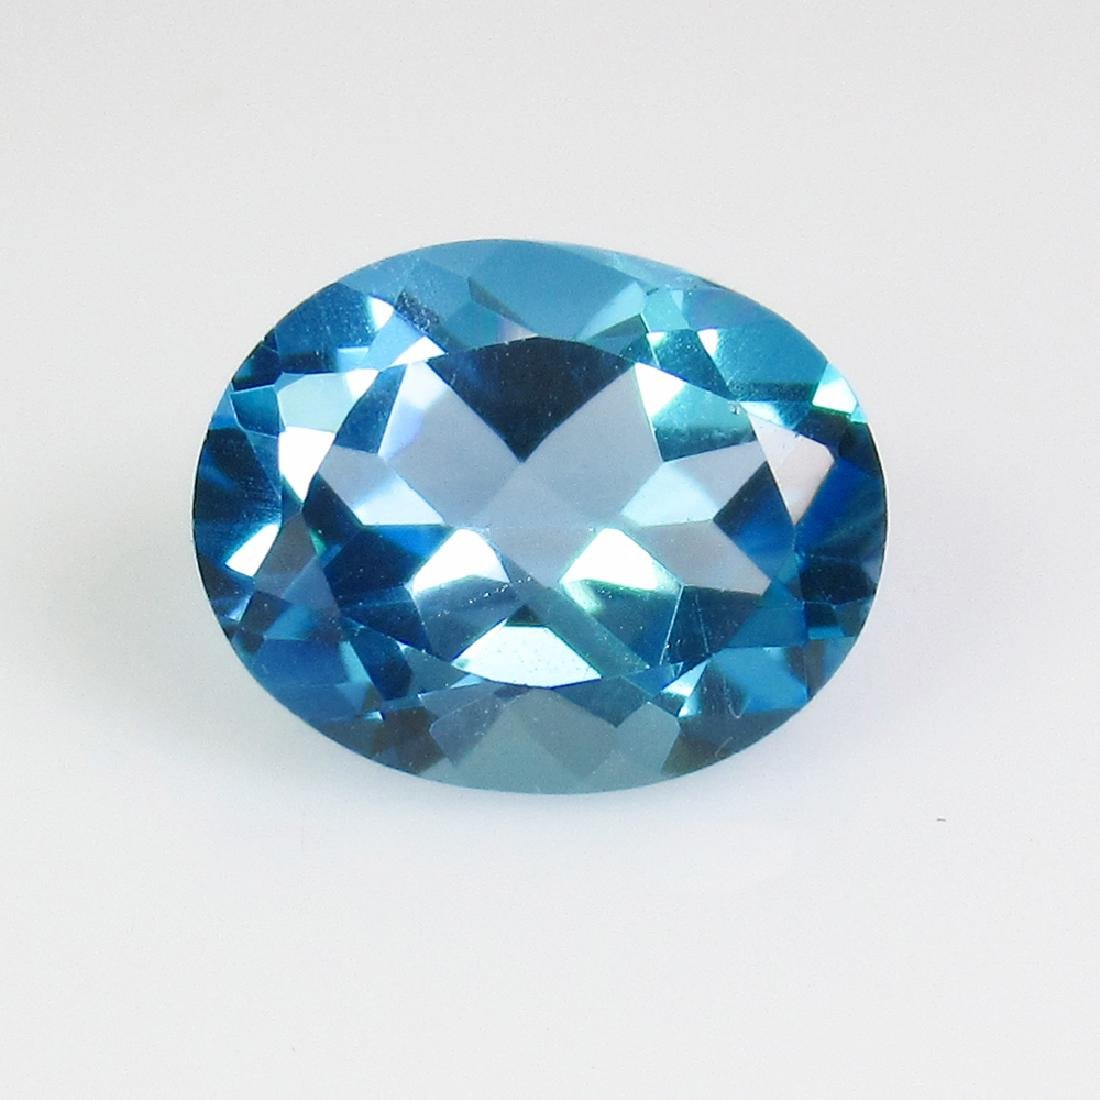 3.31 Ct Genuine Swiss Blue Topaz 10X8 mm Oval Cut